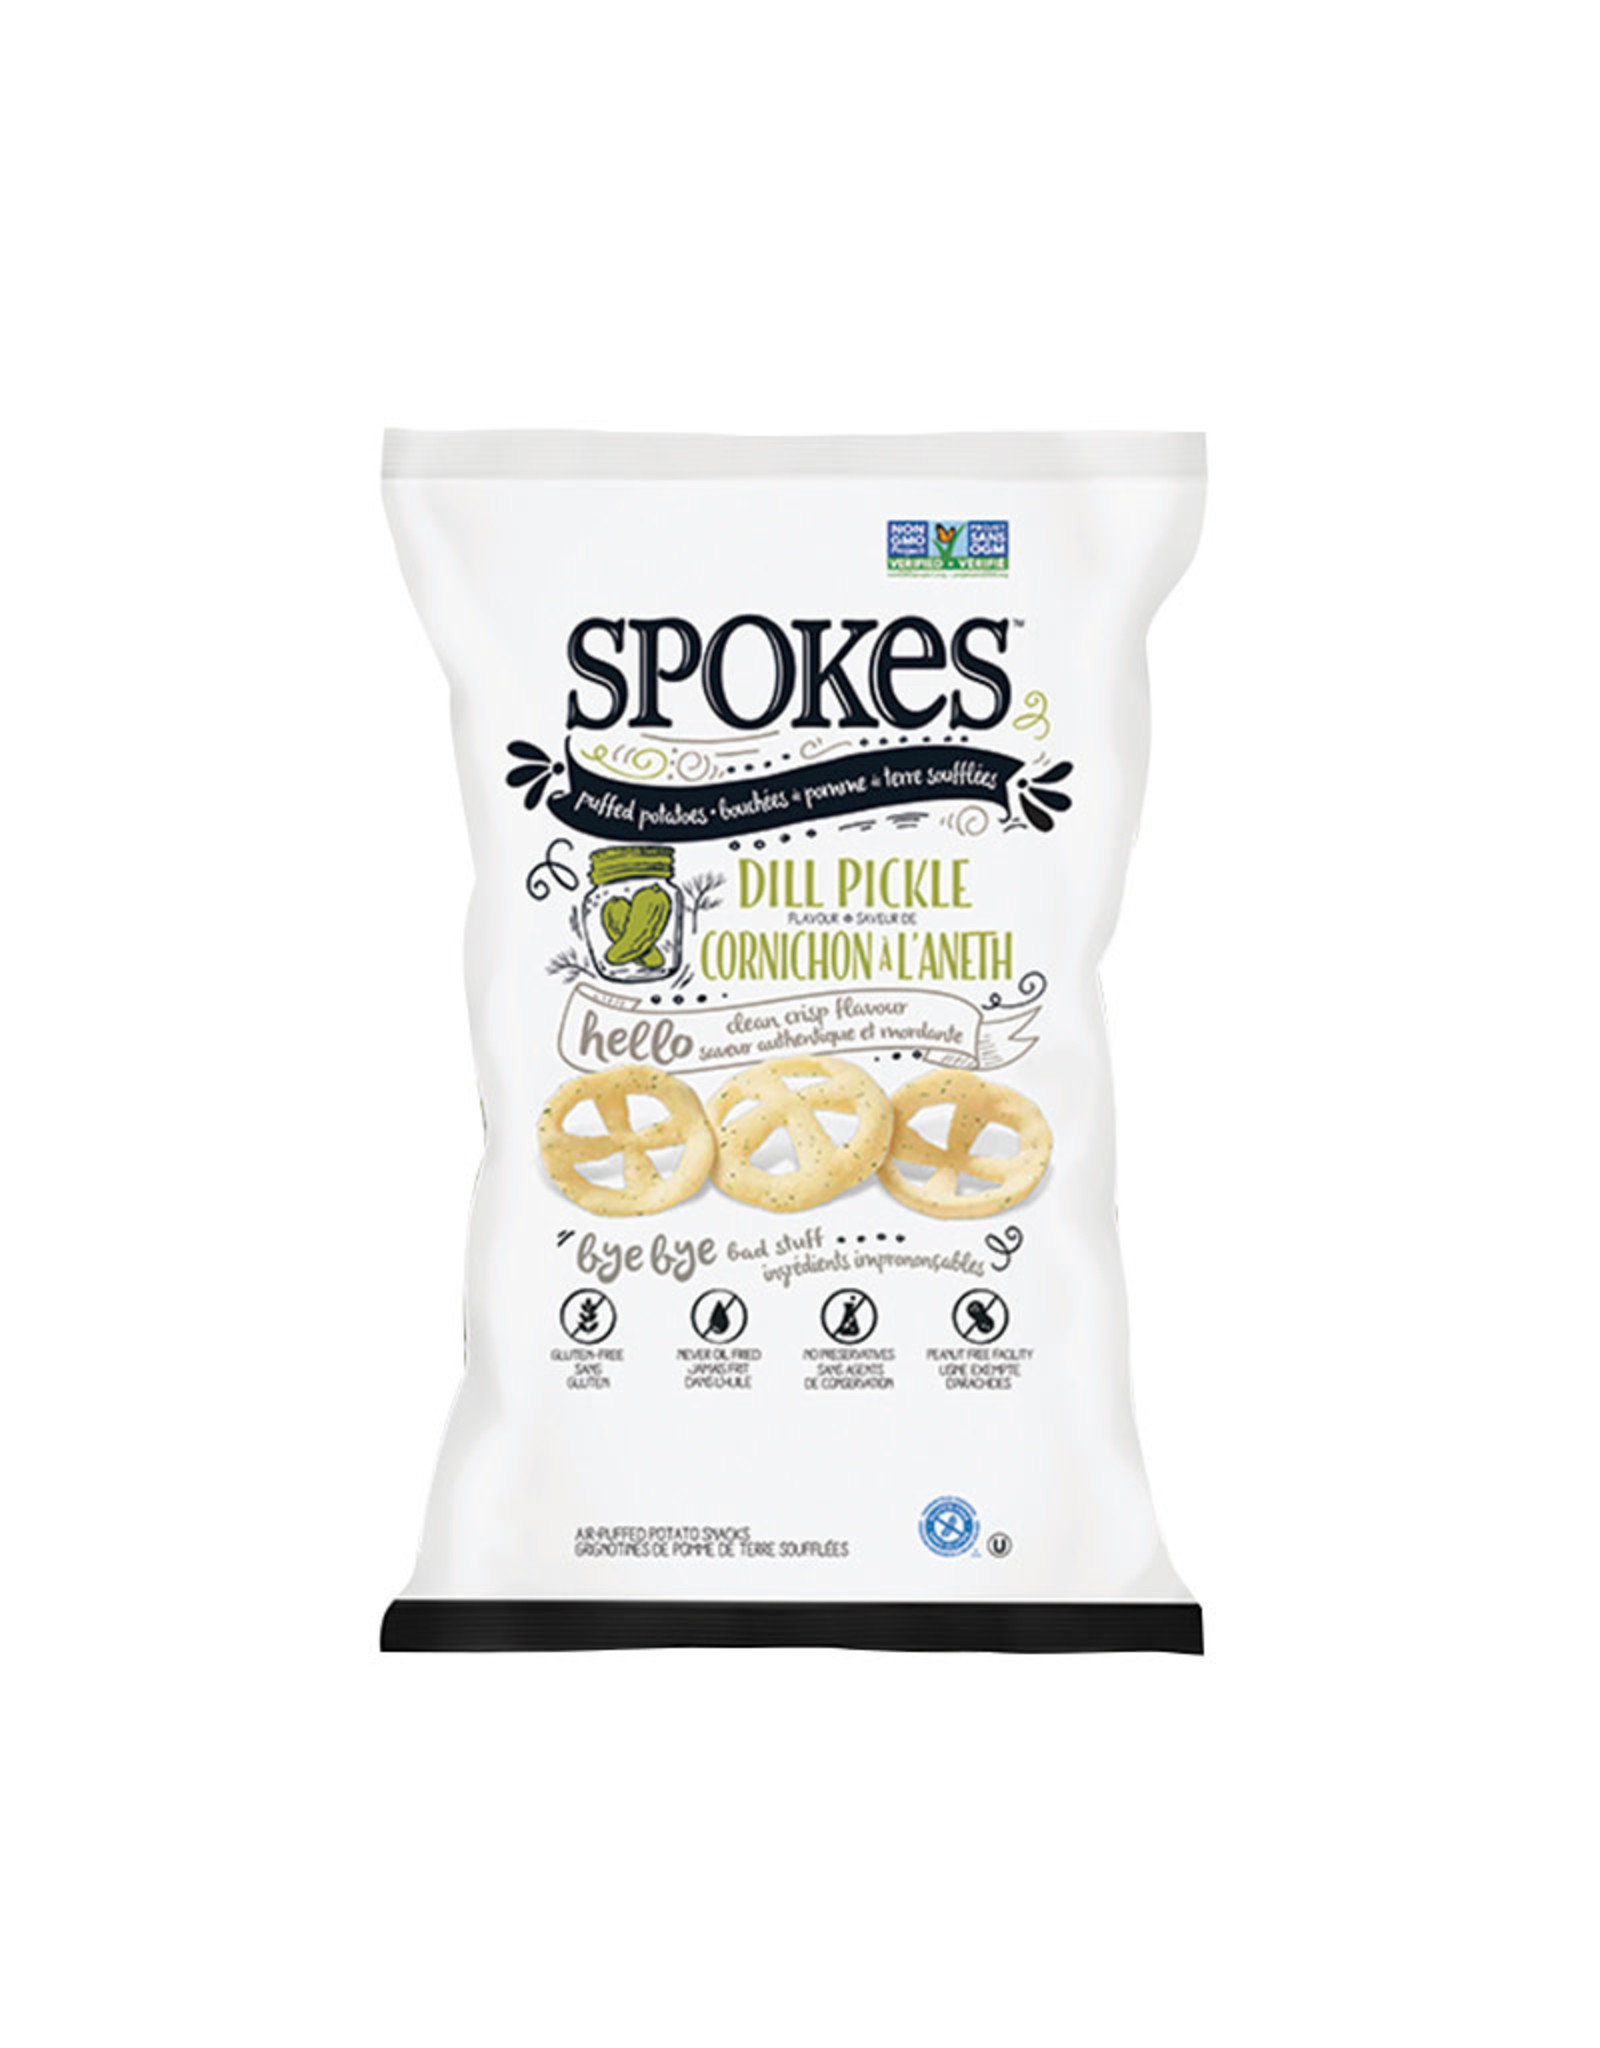 Spokes Spokes - Puffed Potatoes, Dill Pickle (80g)